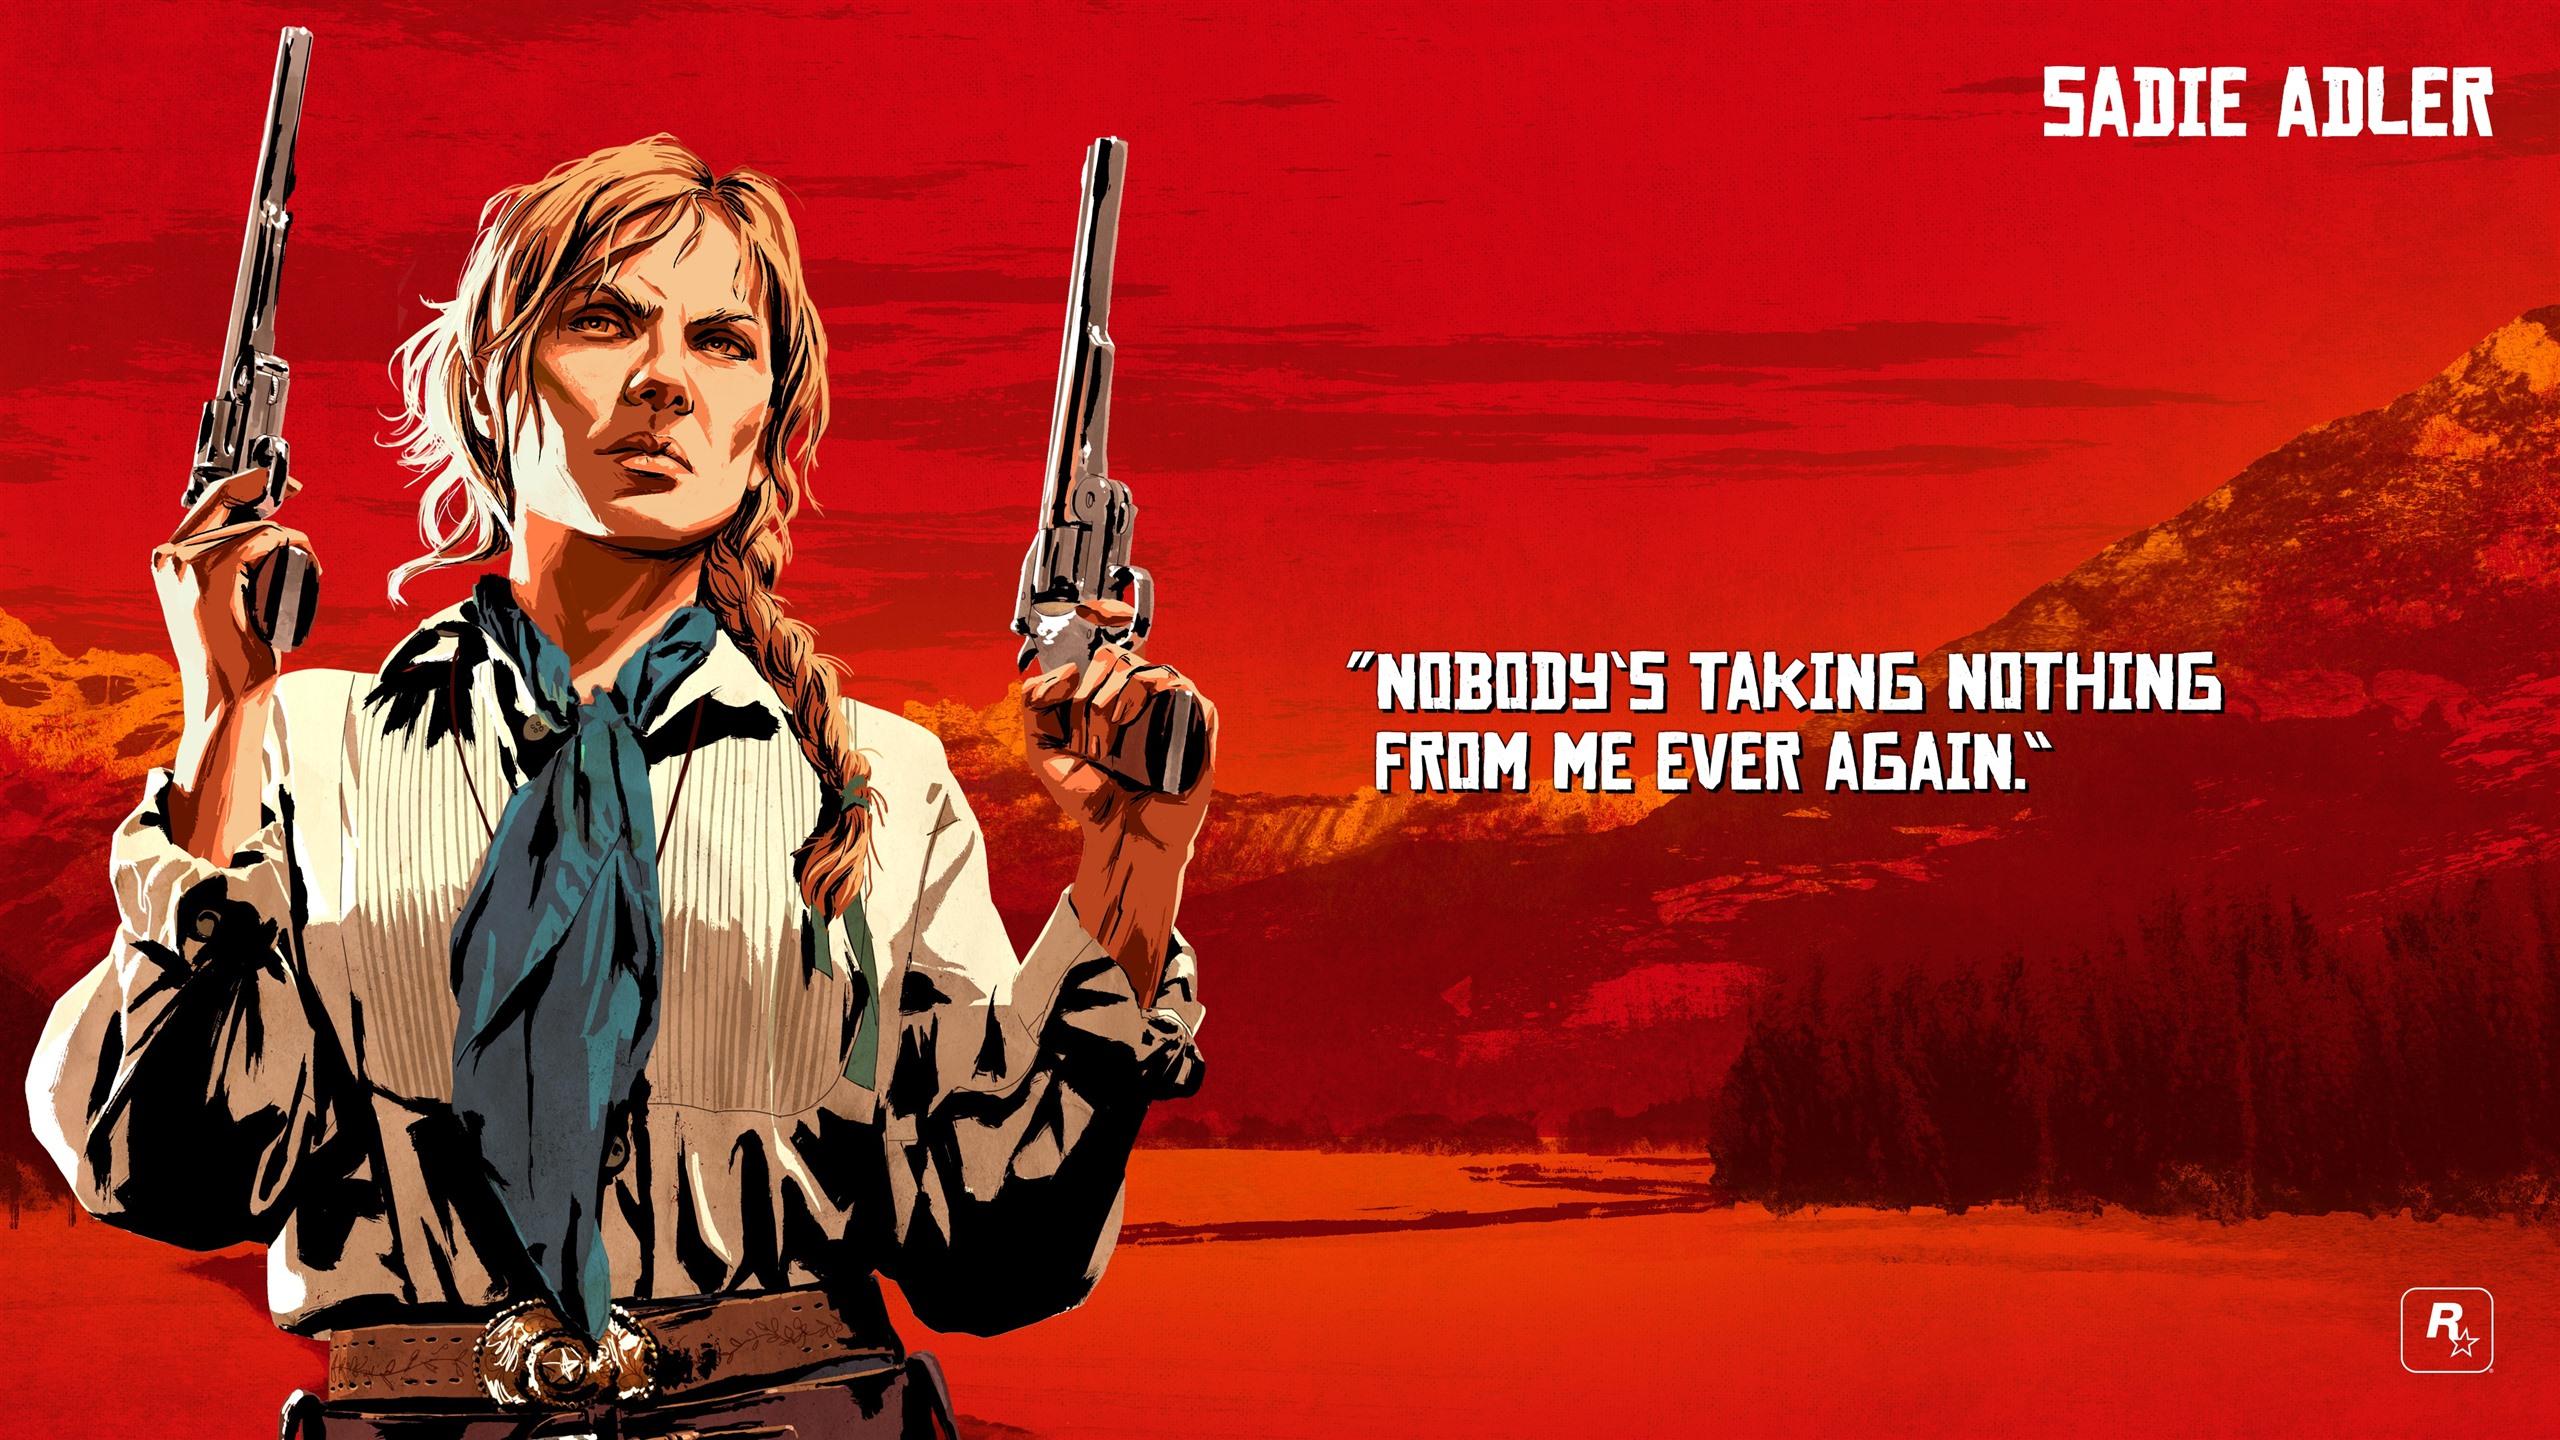 Wallpaper Red Dead Redemption 2 Guns 3840x2160 Uhd 4k Picture Image